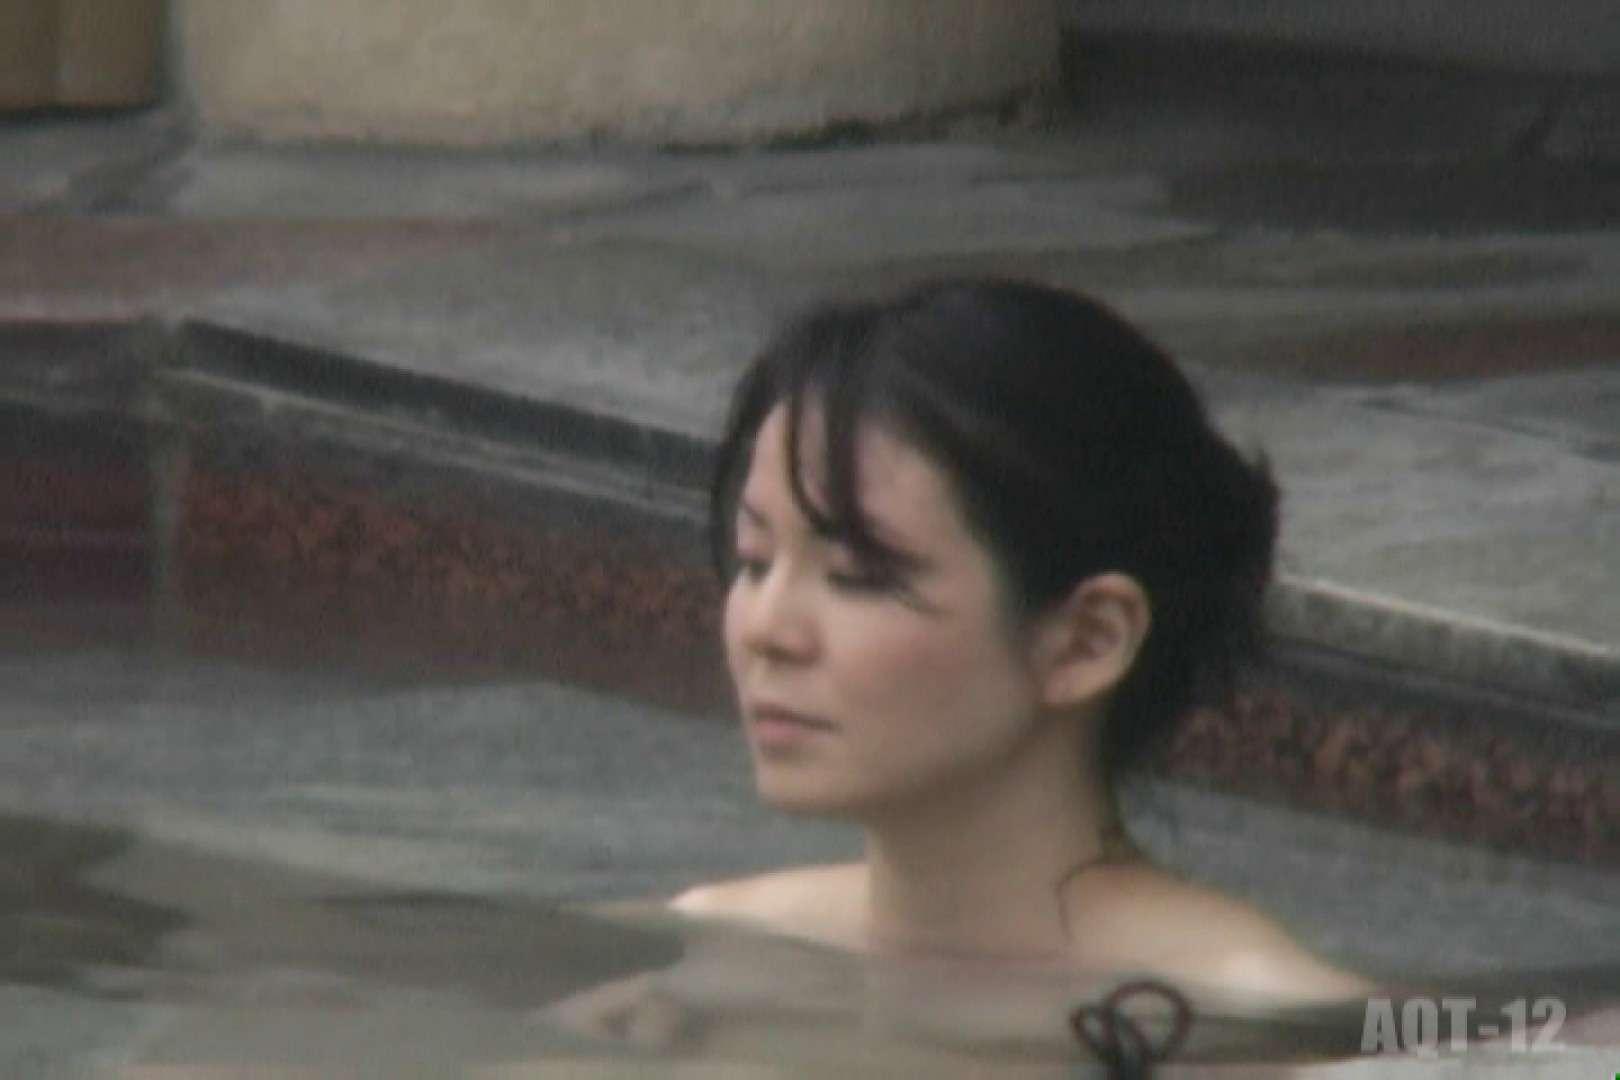 Aquaな露天風呂Vol.811 0  38連発 4